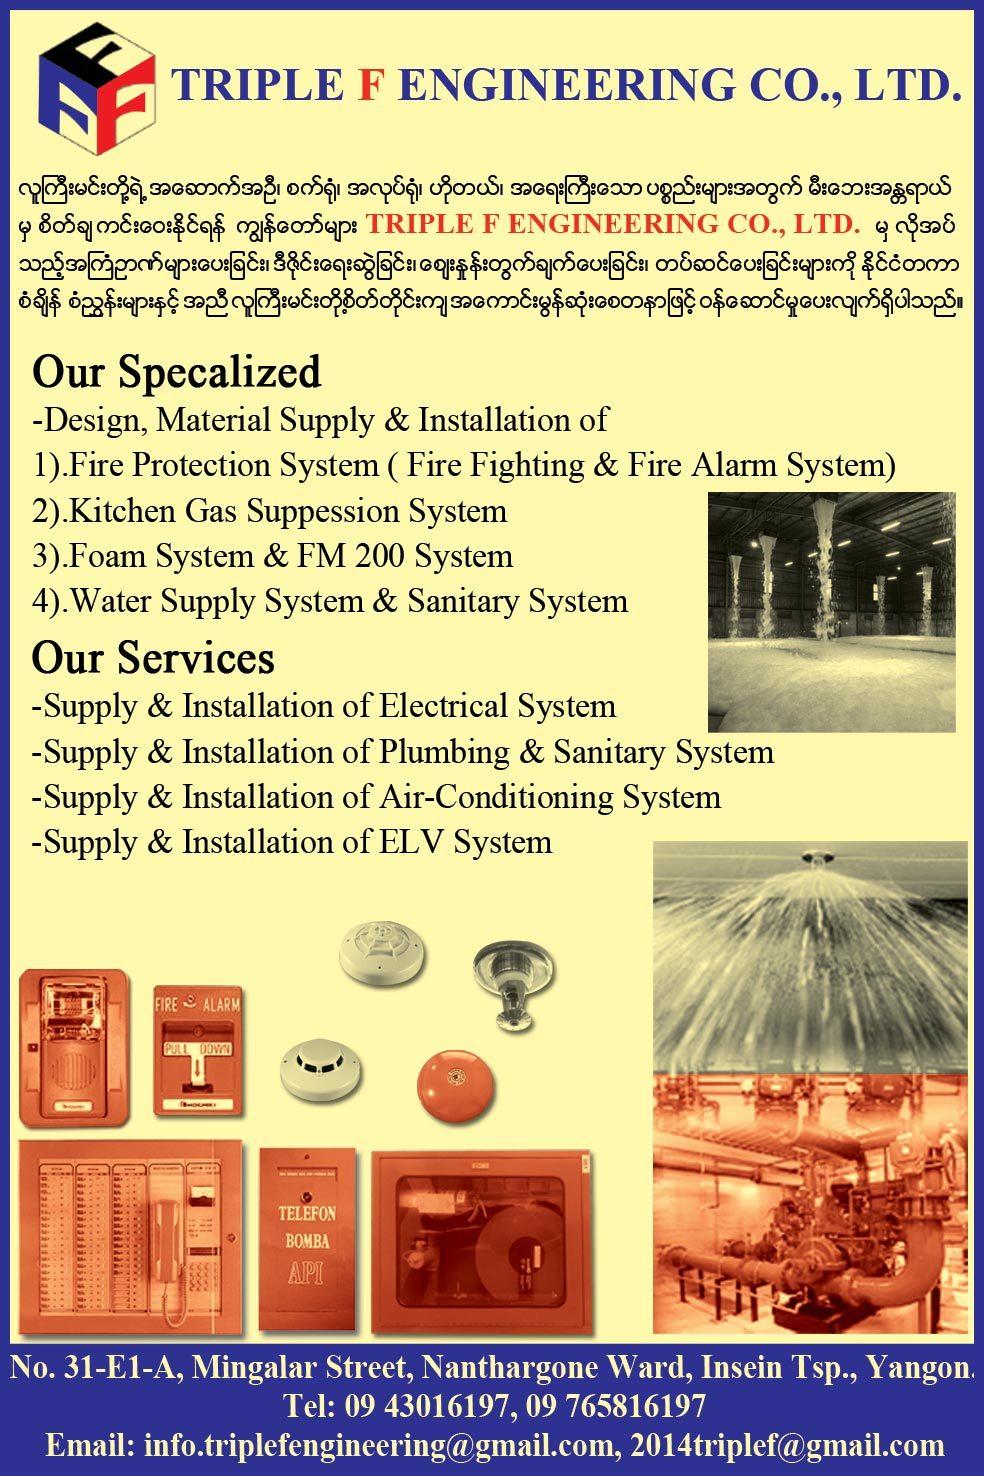 Triple-F-Engineering-Co-Ltd_Fire-Extinguishers-&-Fire-Fighting-Equipment_1915.jpg